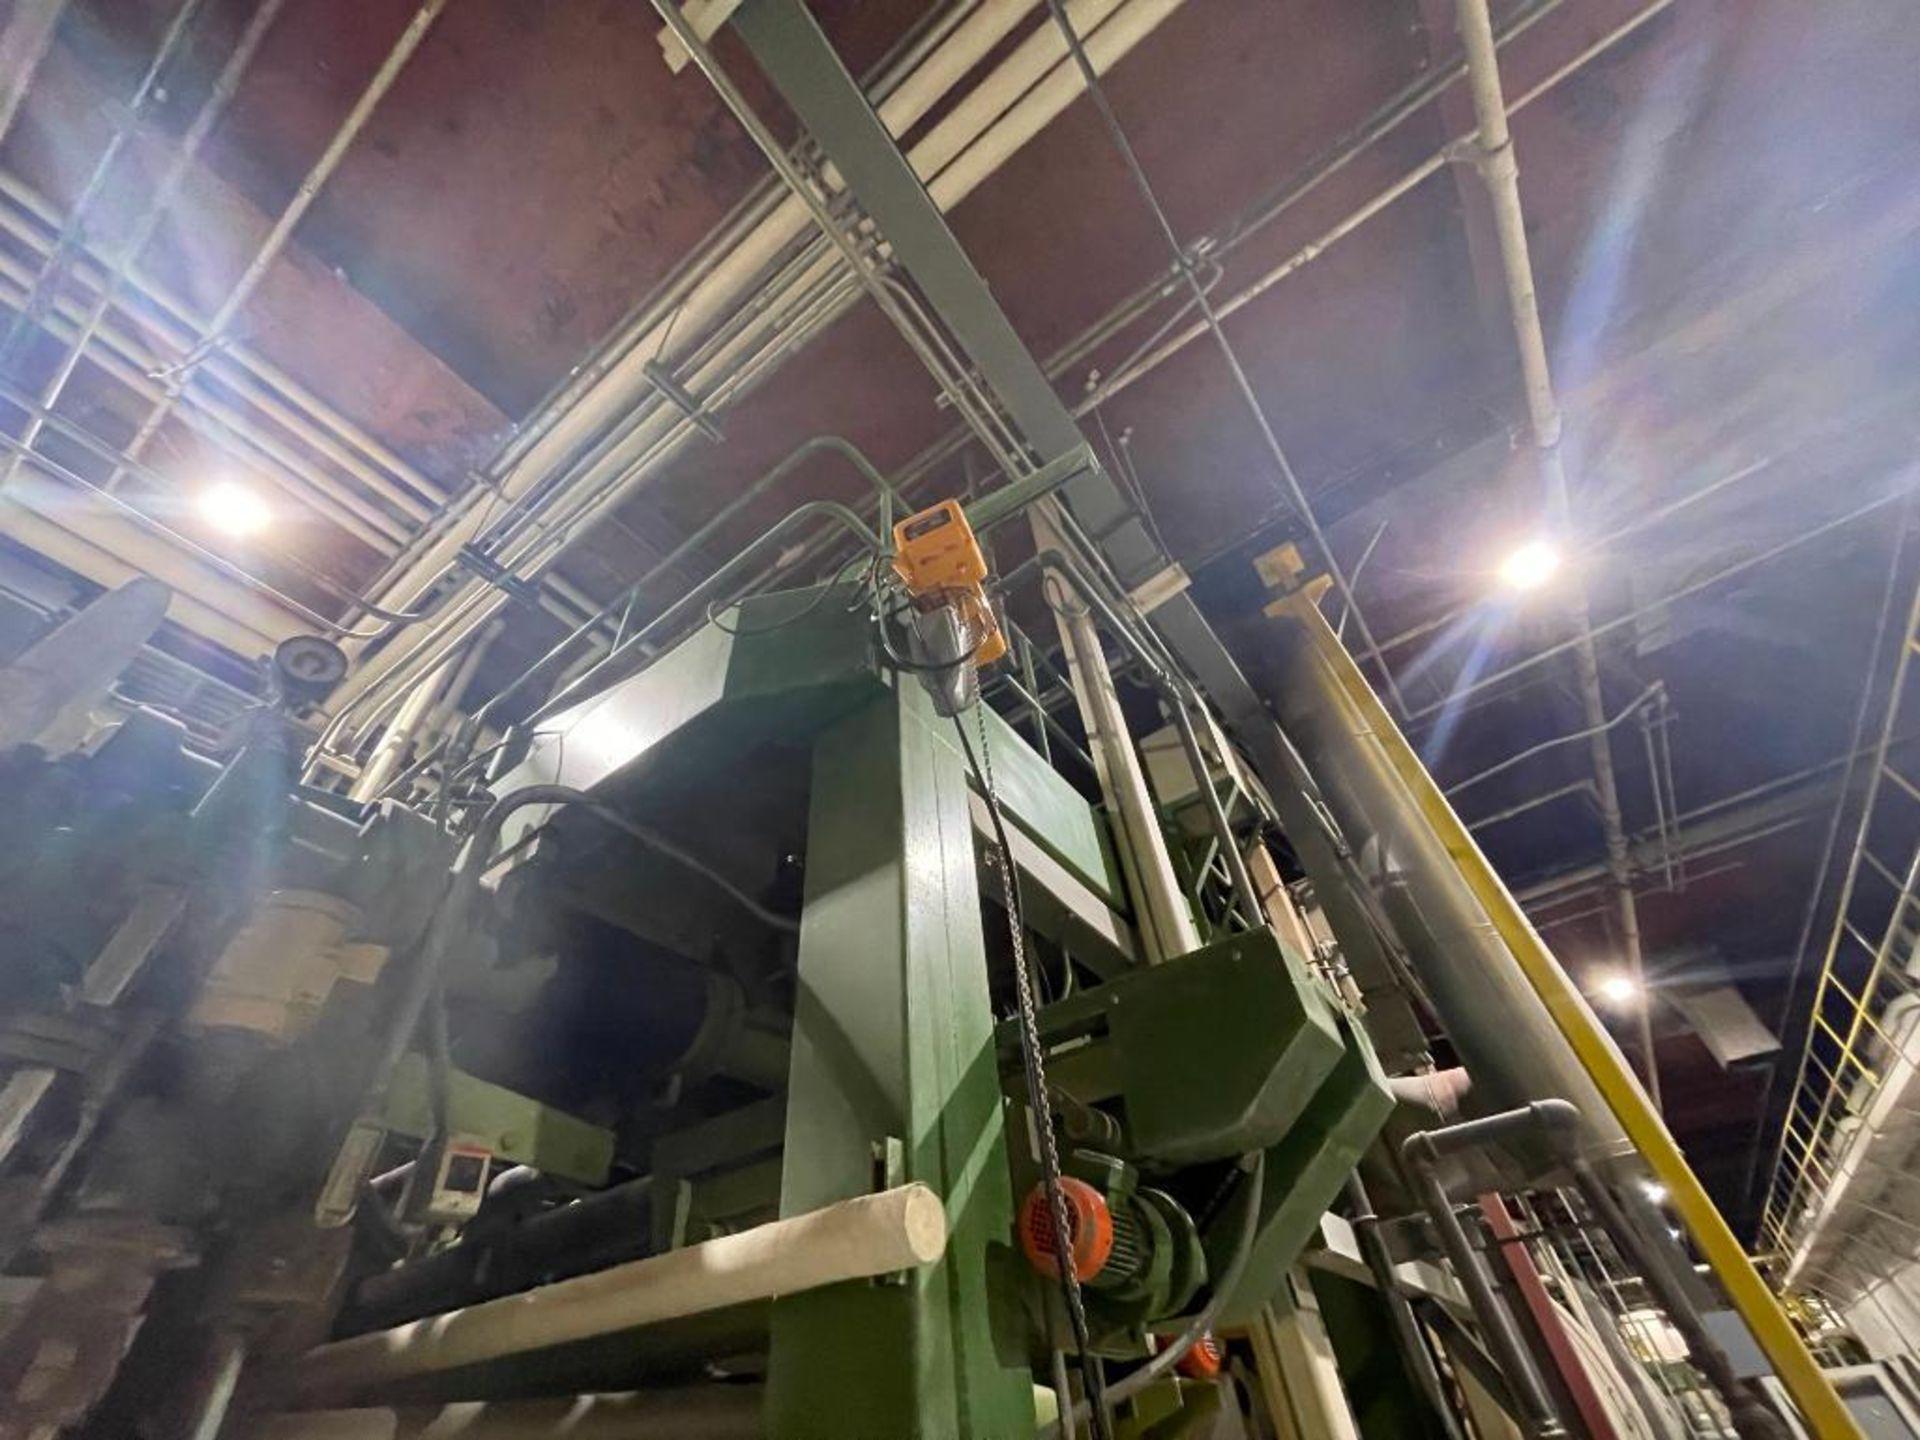 Harrington .25 ton chain hoist - Image 5 of 10